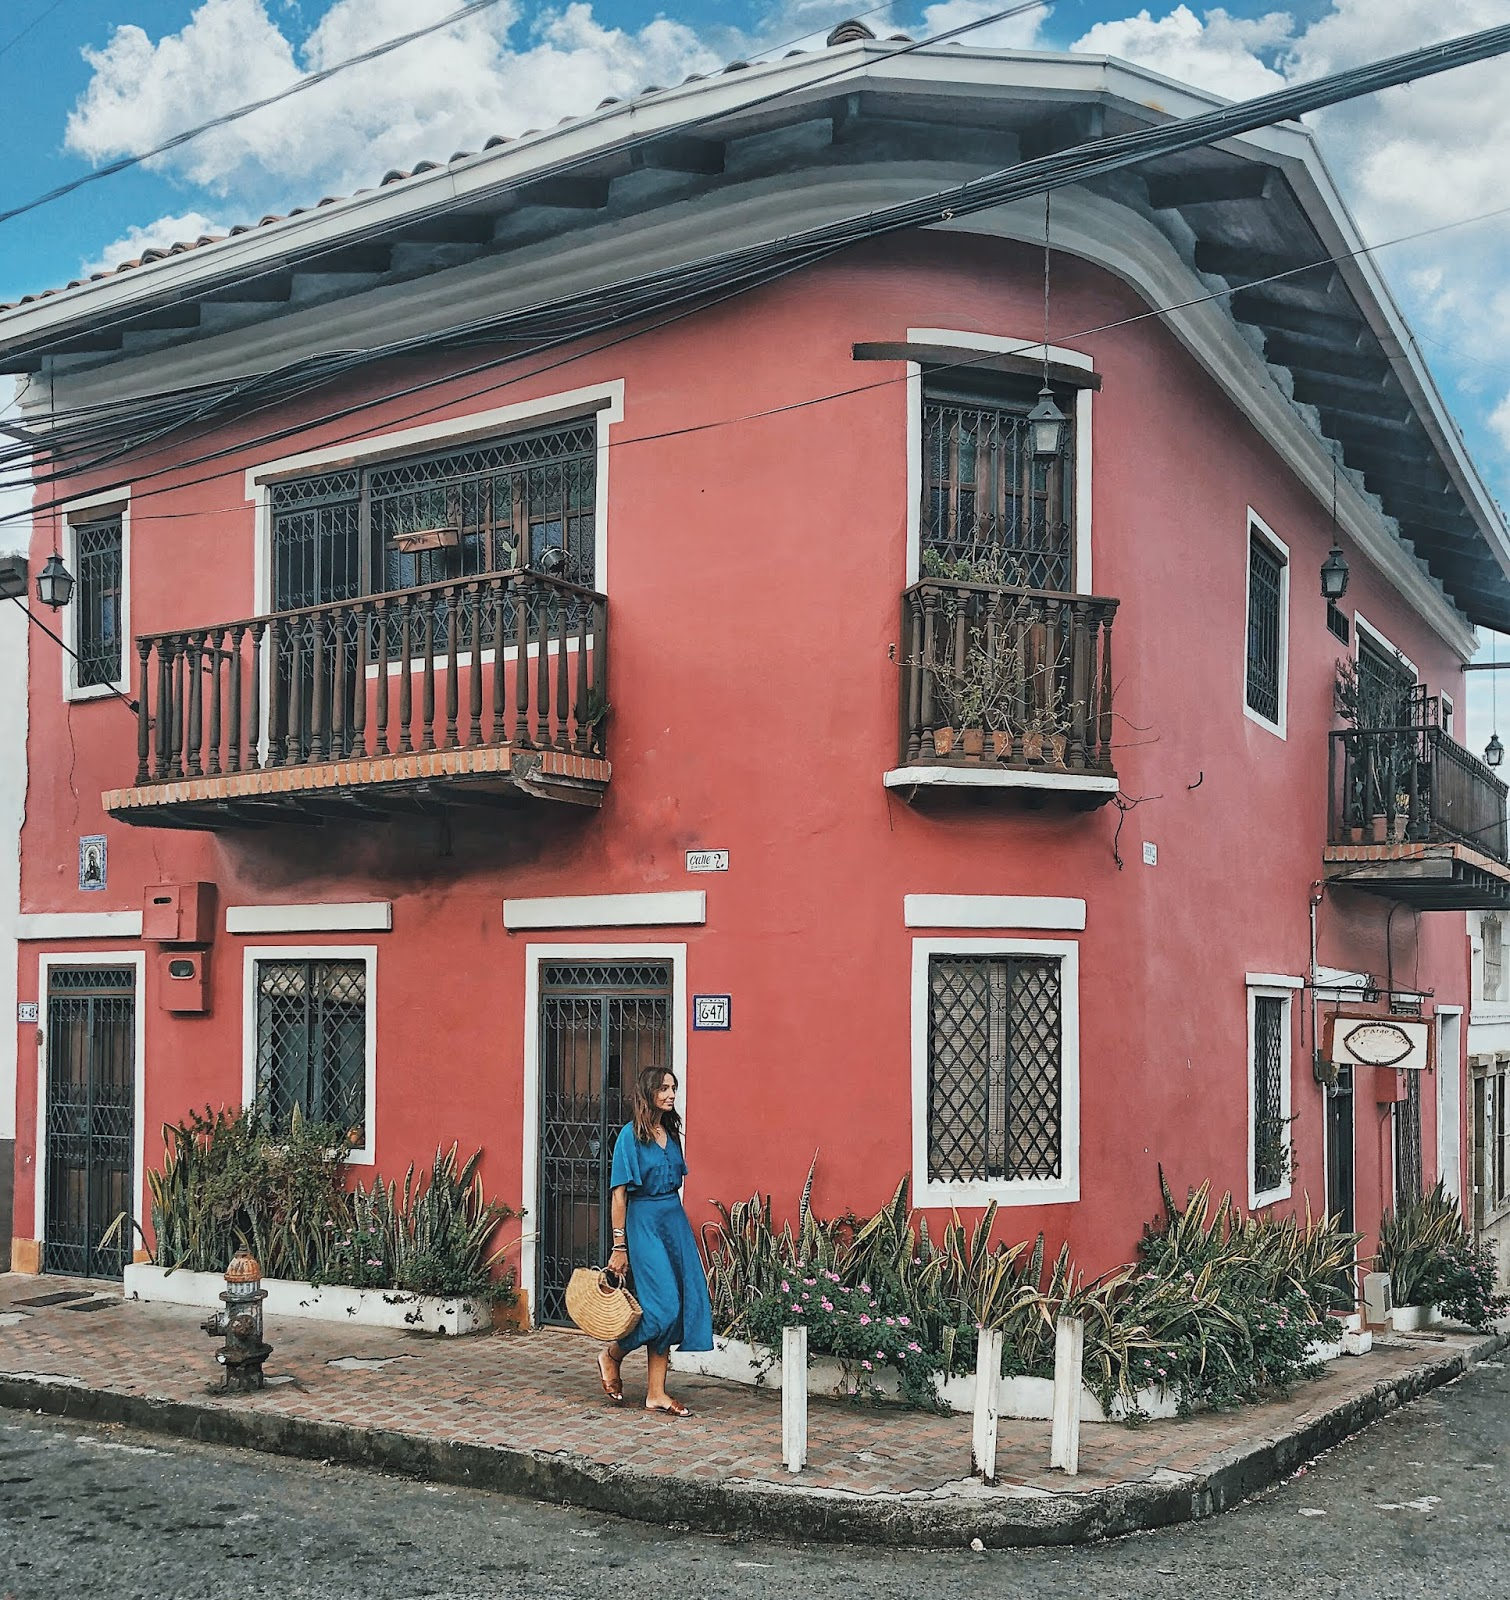 el_blog_de_silvia_cali_viaje_a_colombia